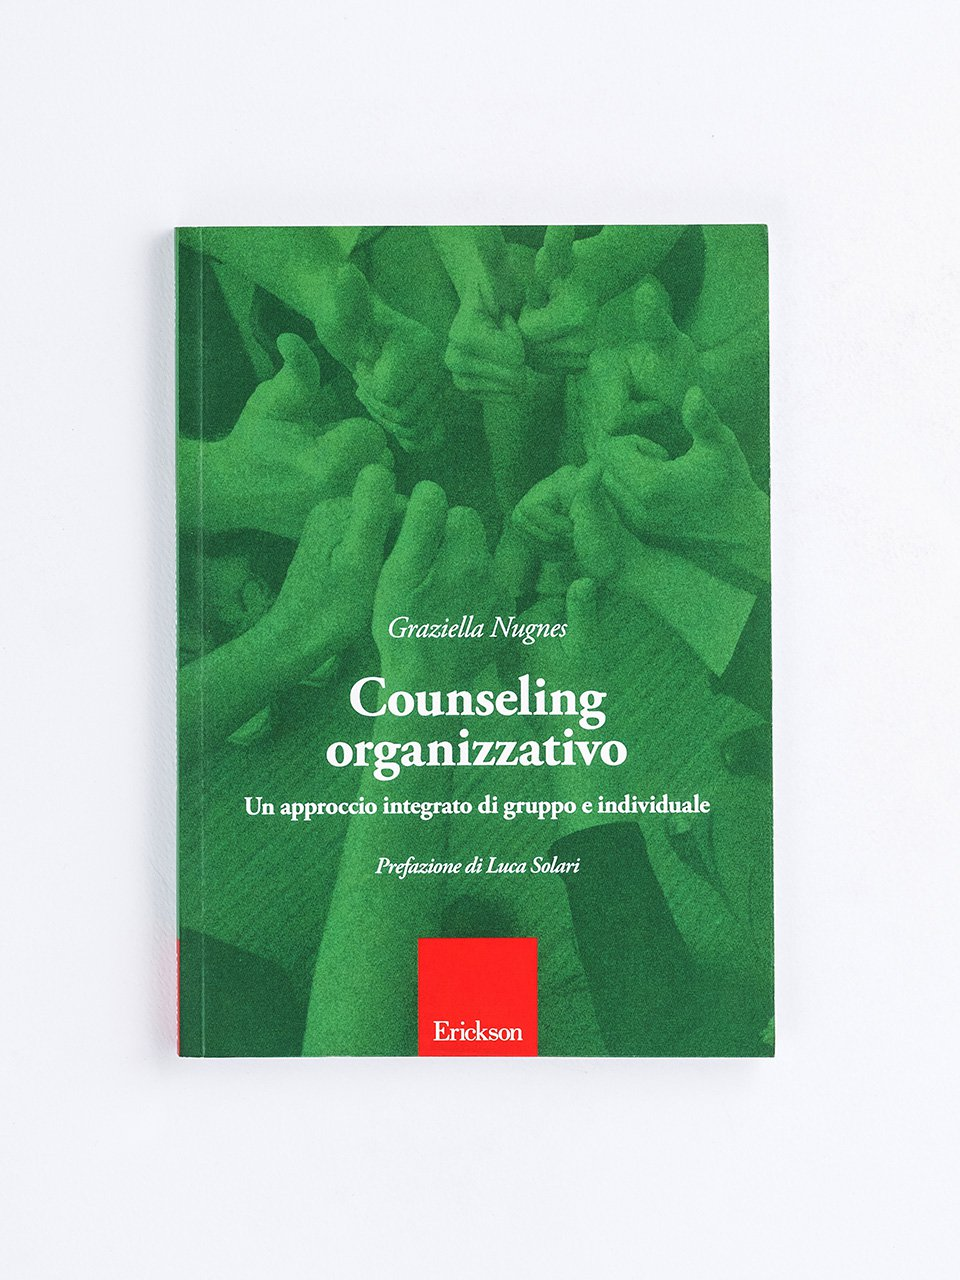 Counseling organizzativo - Career counseling - Libri - Erickson